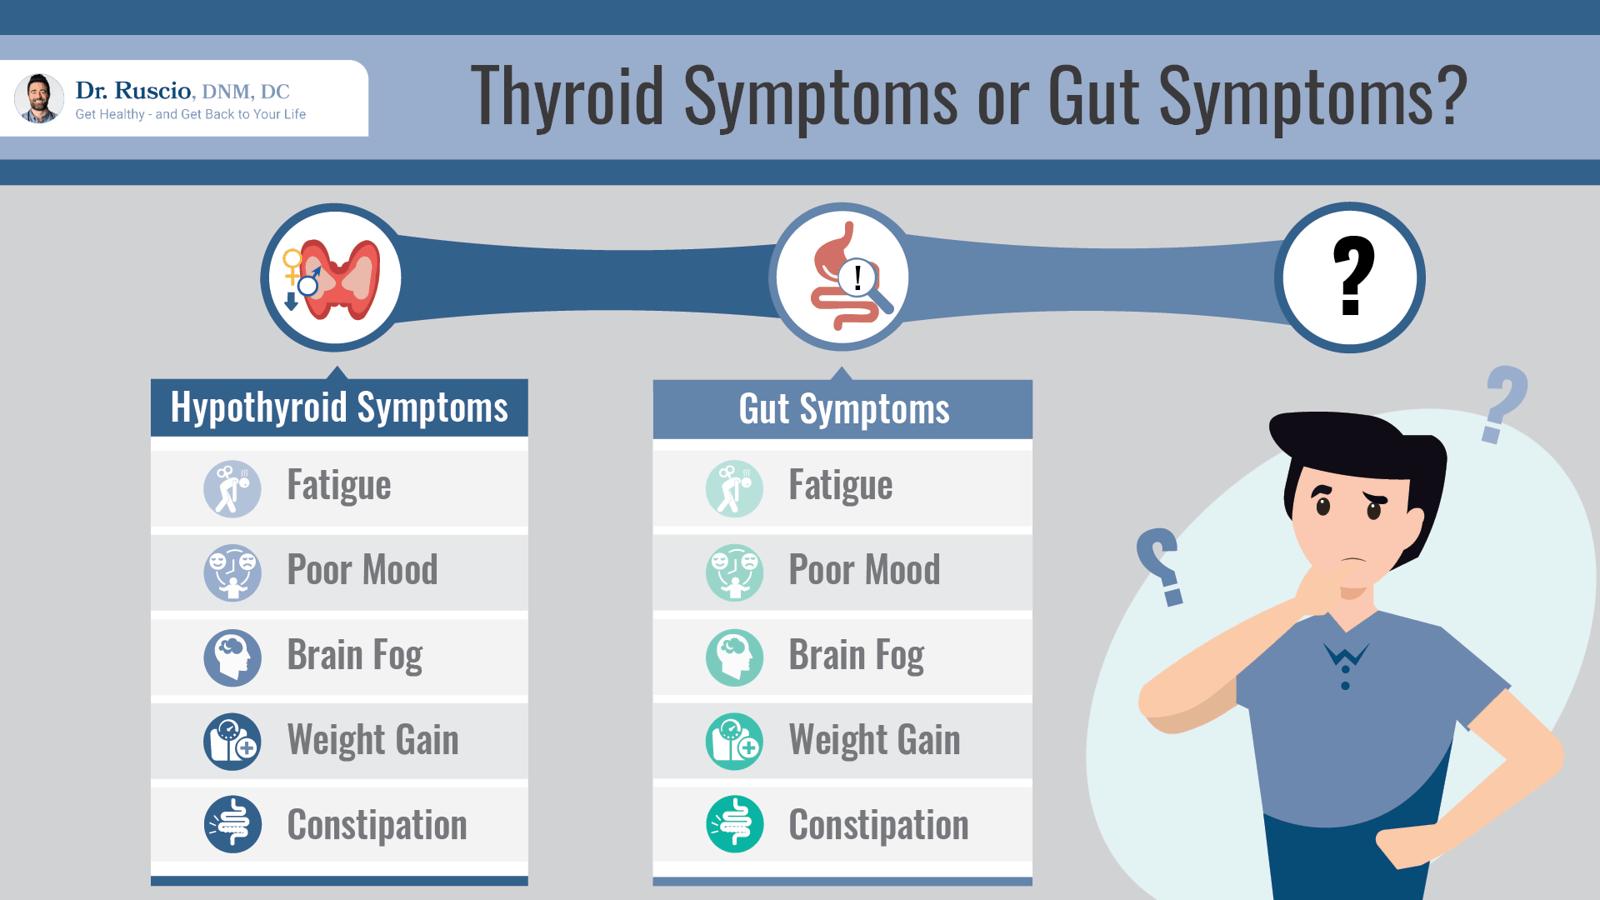 Hypothyroidism medication: Thyroid symptoms vs gut symptoms infographic by Dr. Ruscio